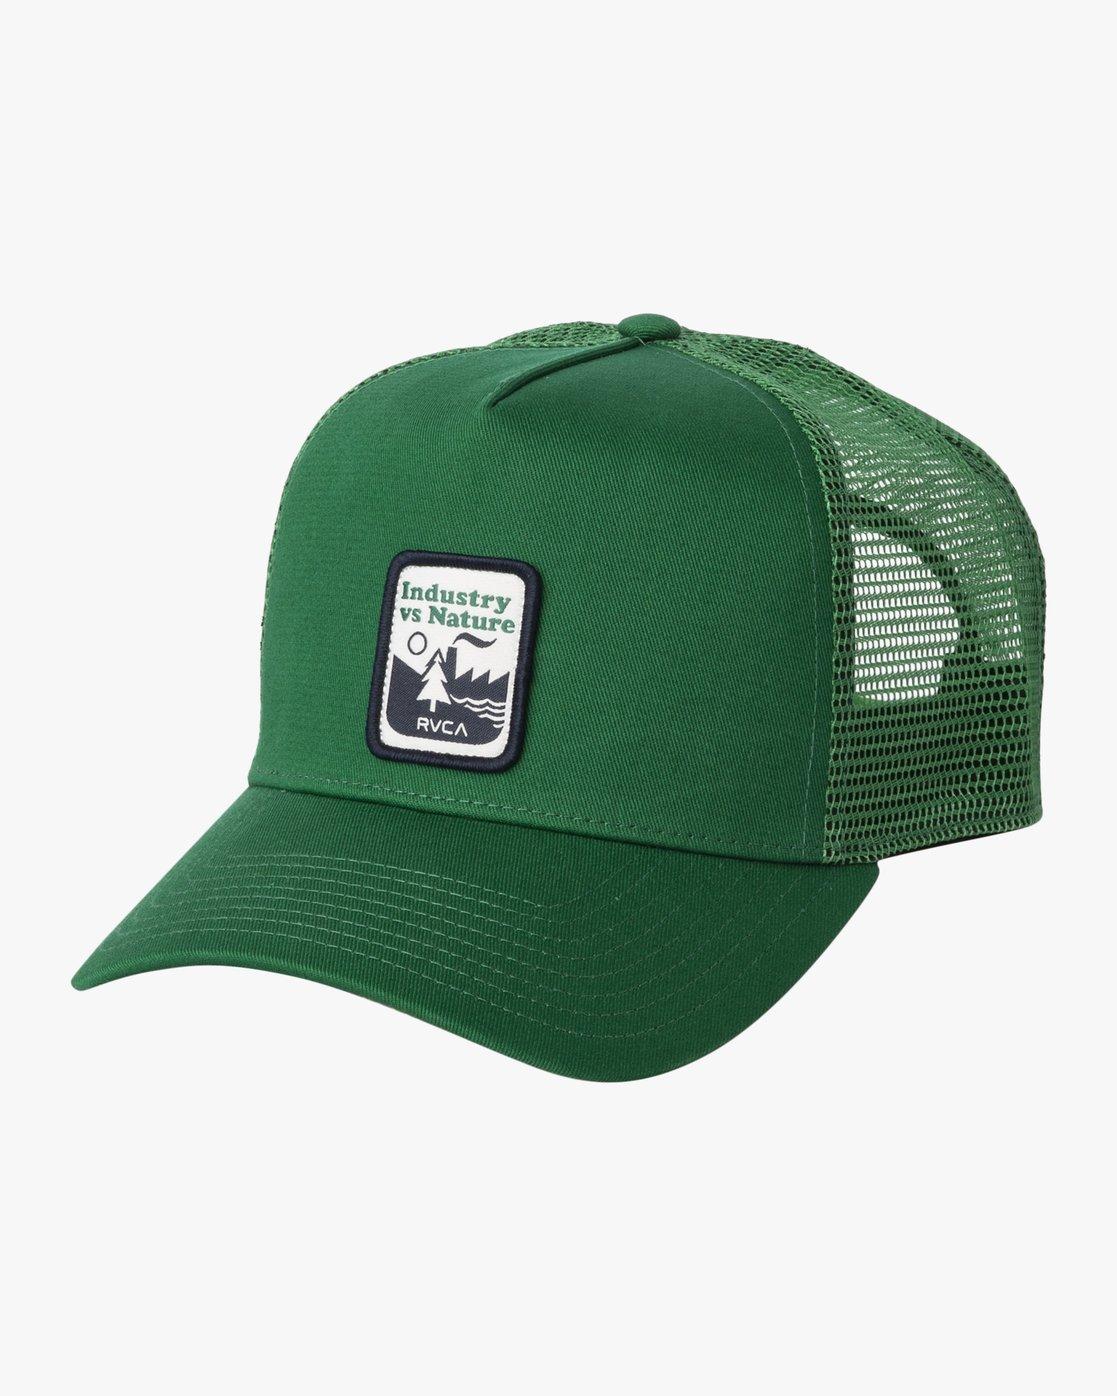 0 LINX CURVED TRUCKER Green MAHW3RLX RVCA